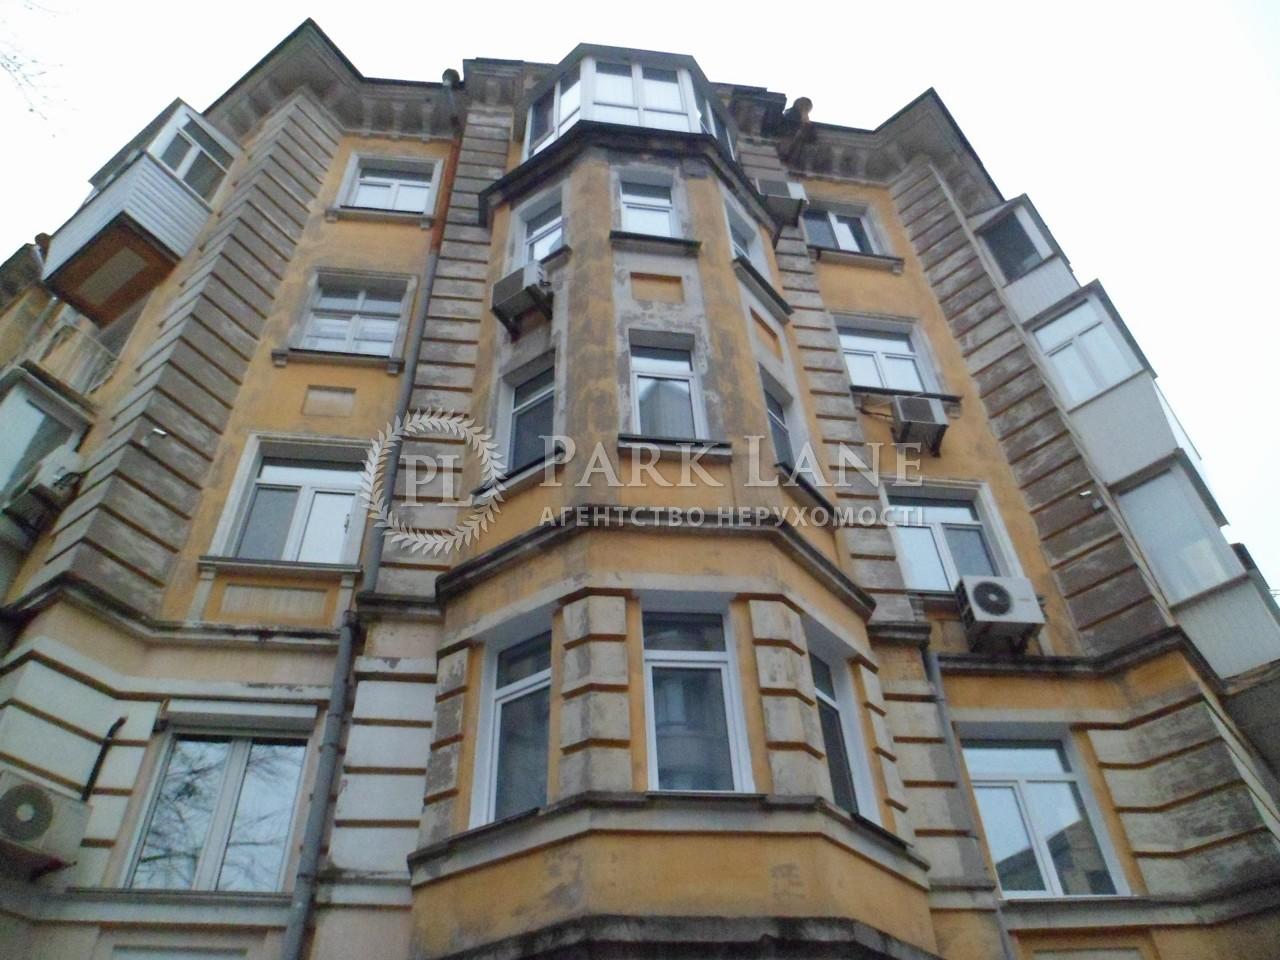 Квартира ул. Шелковичная, 18б, Киев, Z-1075191 - Фото 1